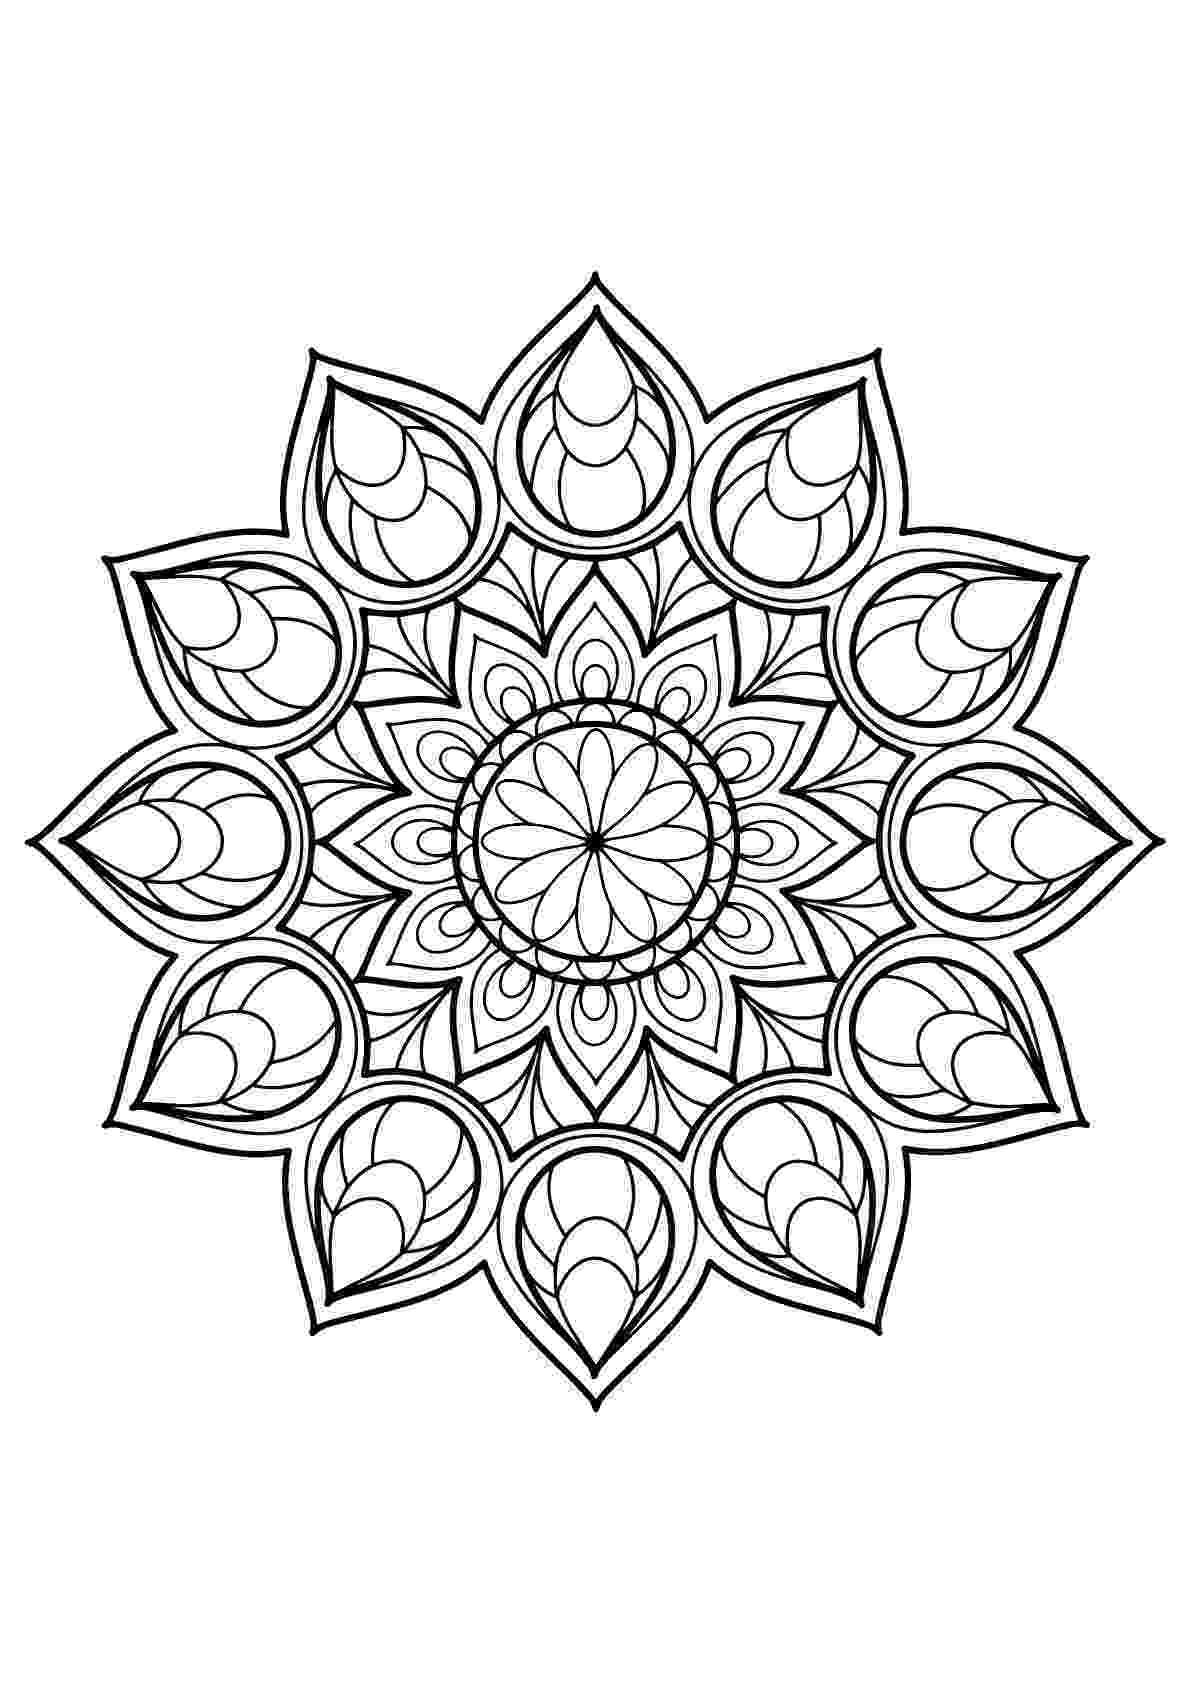 mandala to color flower mandala coloring pages best coloring pages for kids color to mandala 1 1